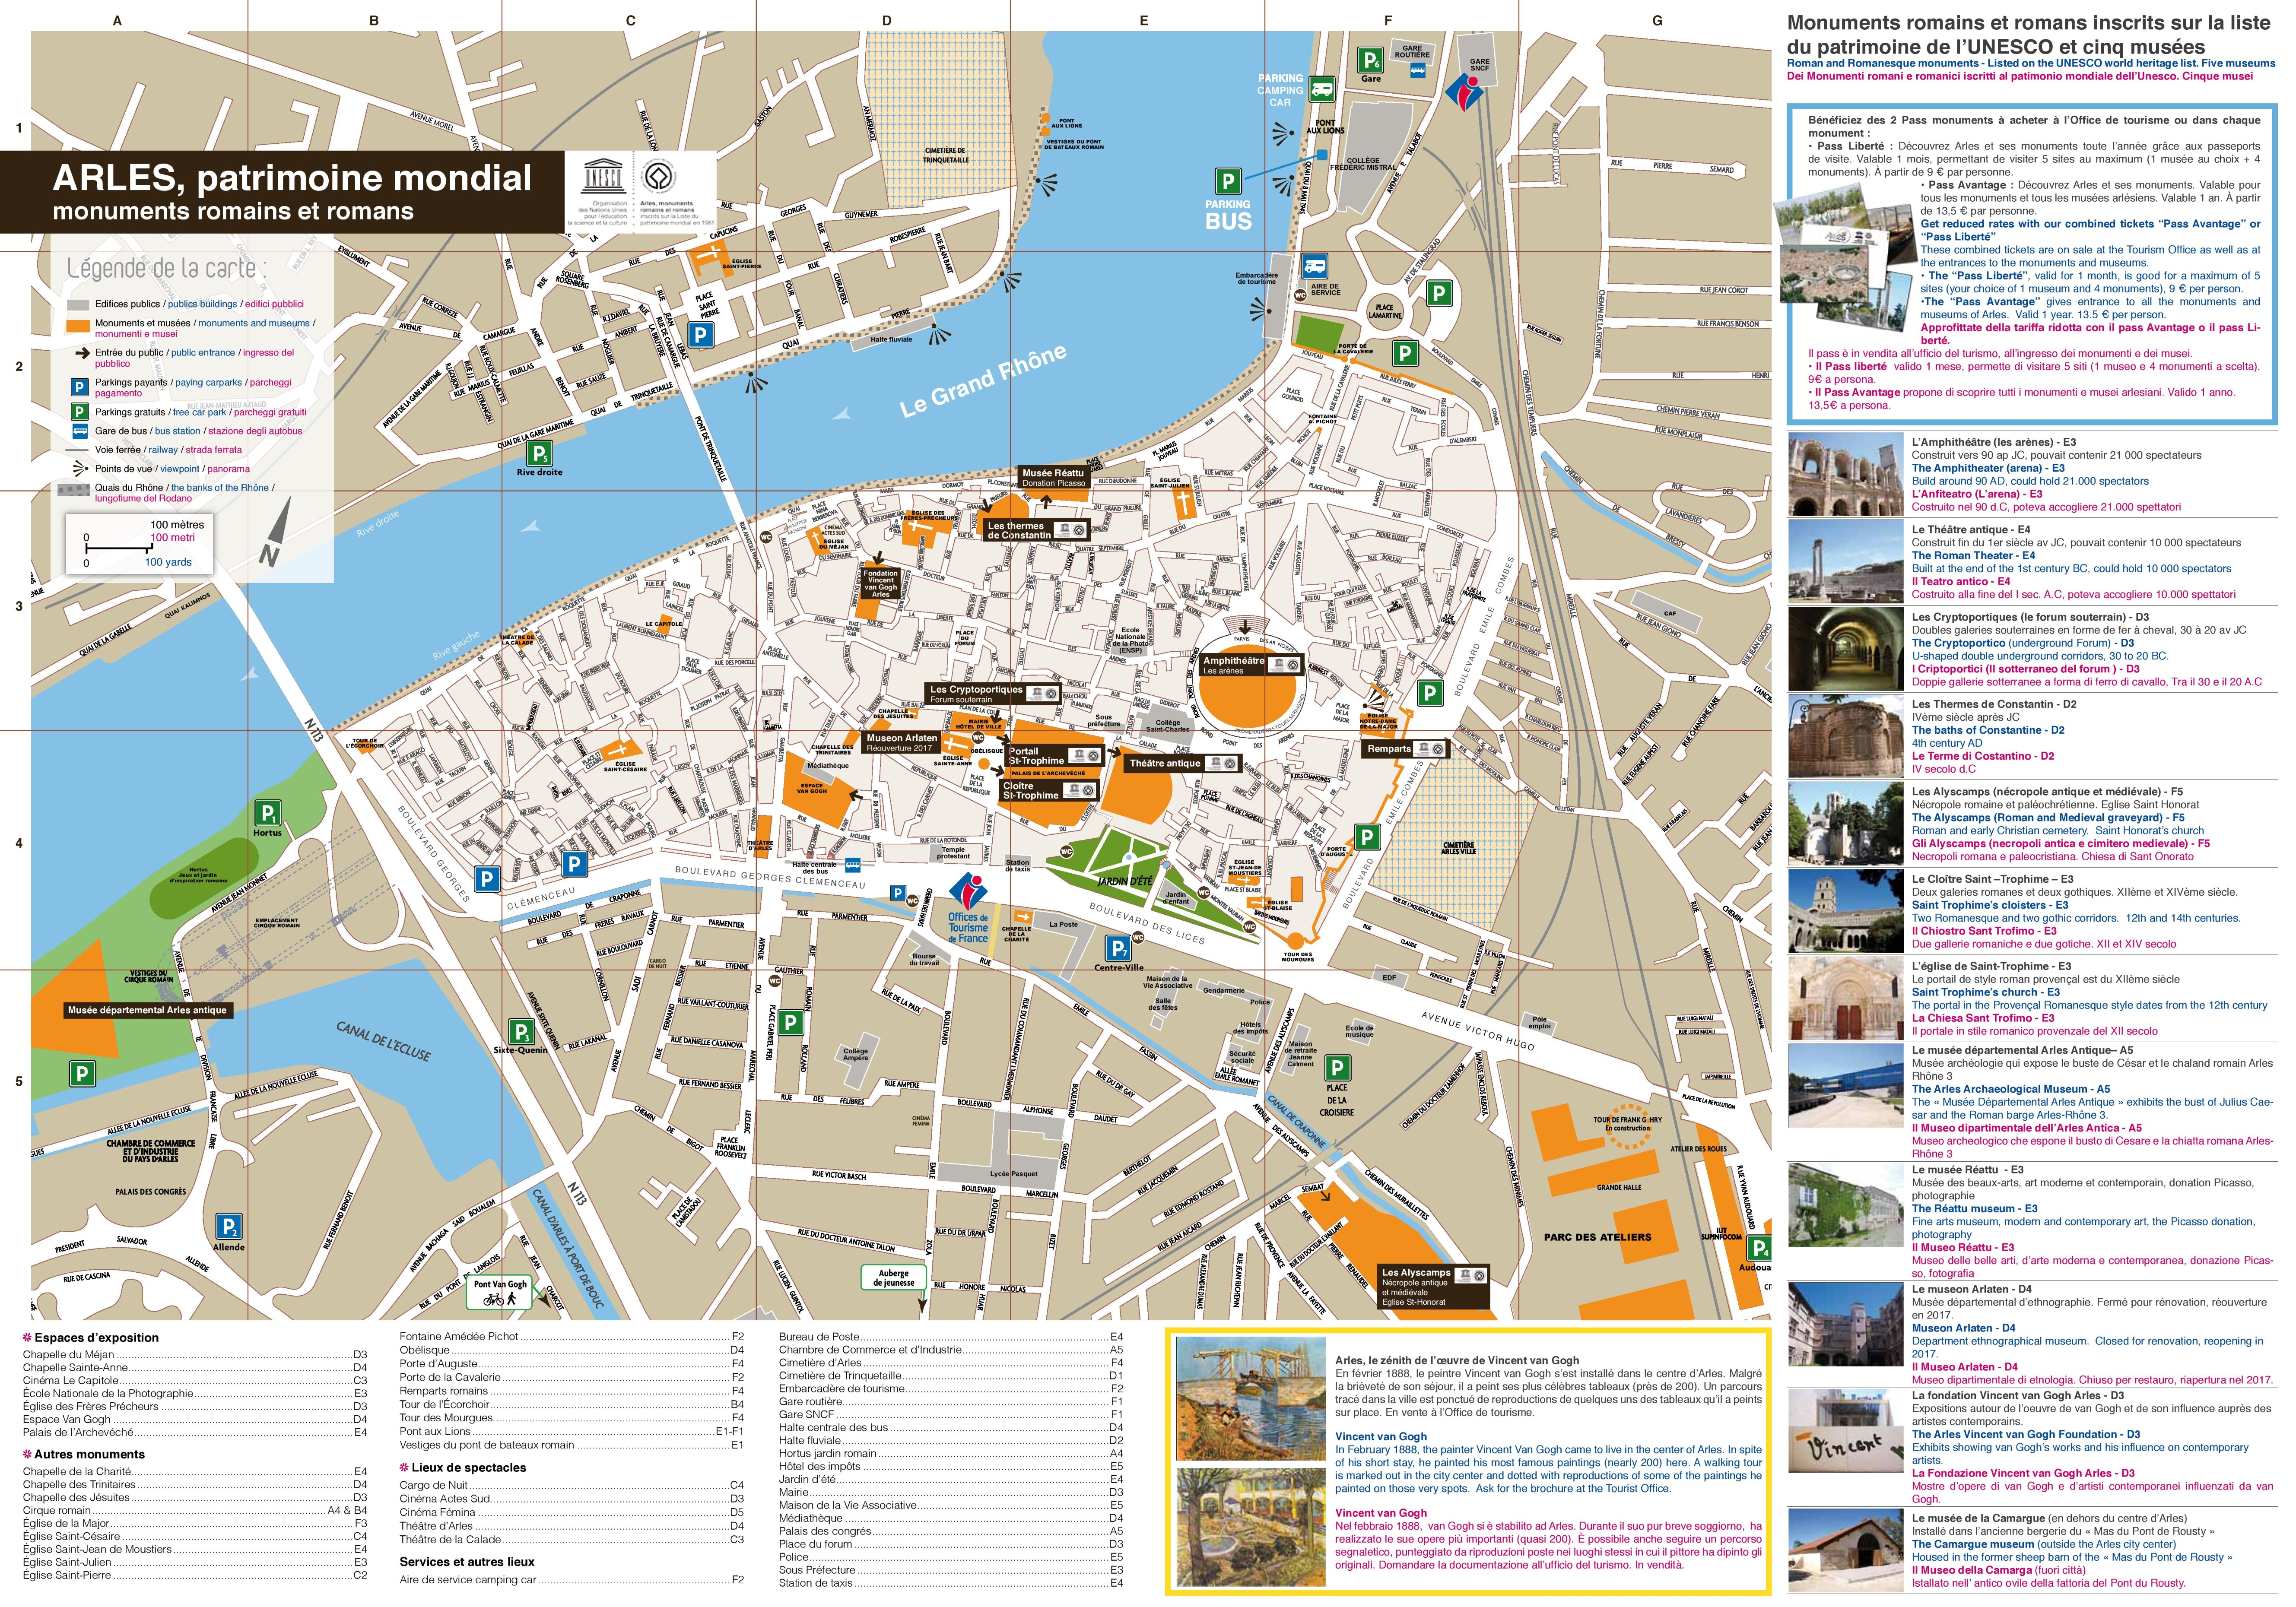 Arles sightseeing map